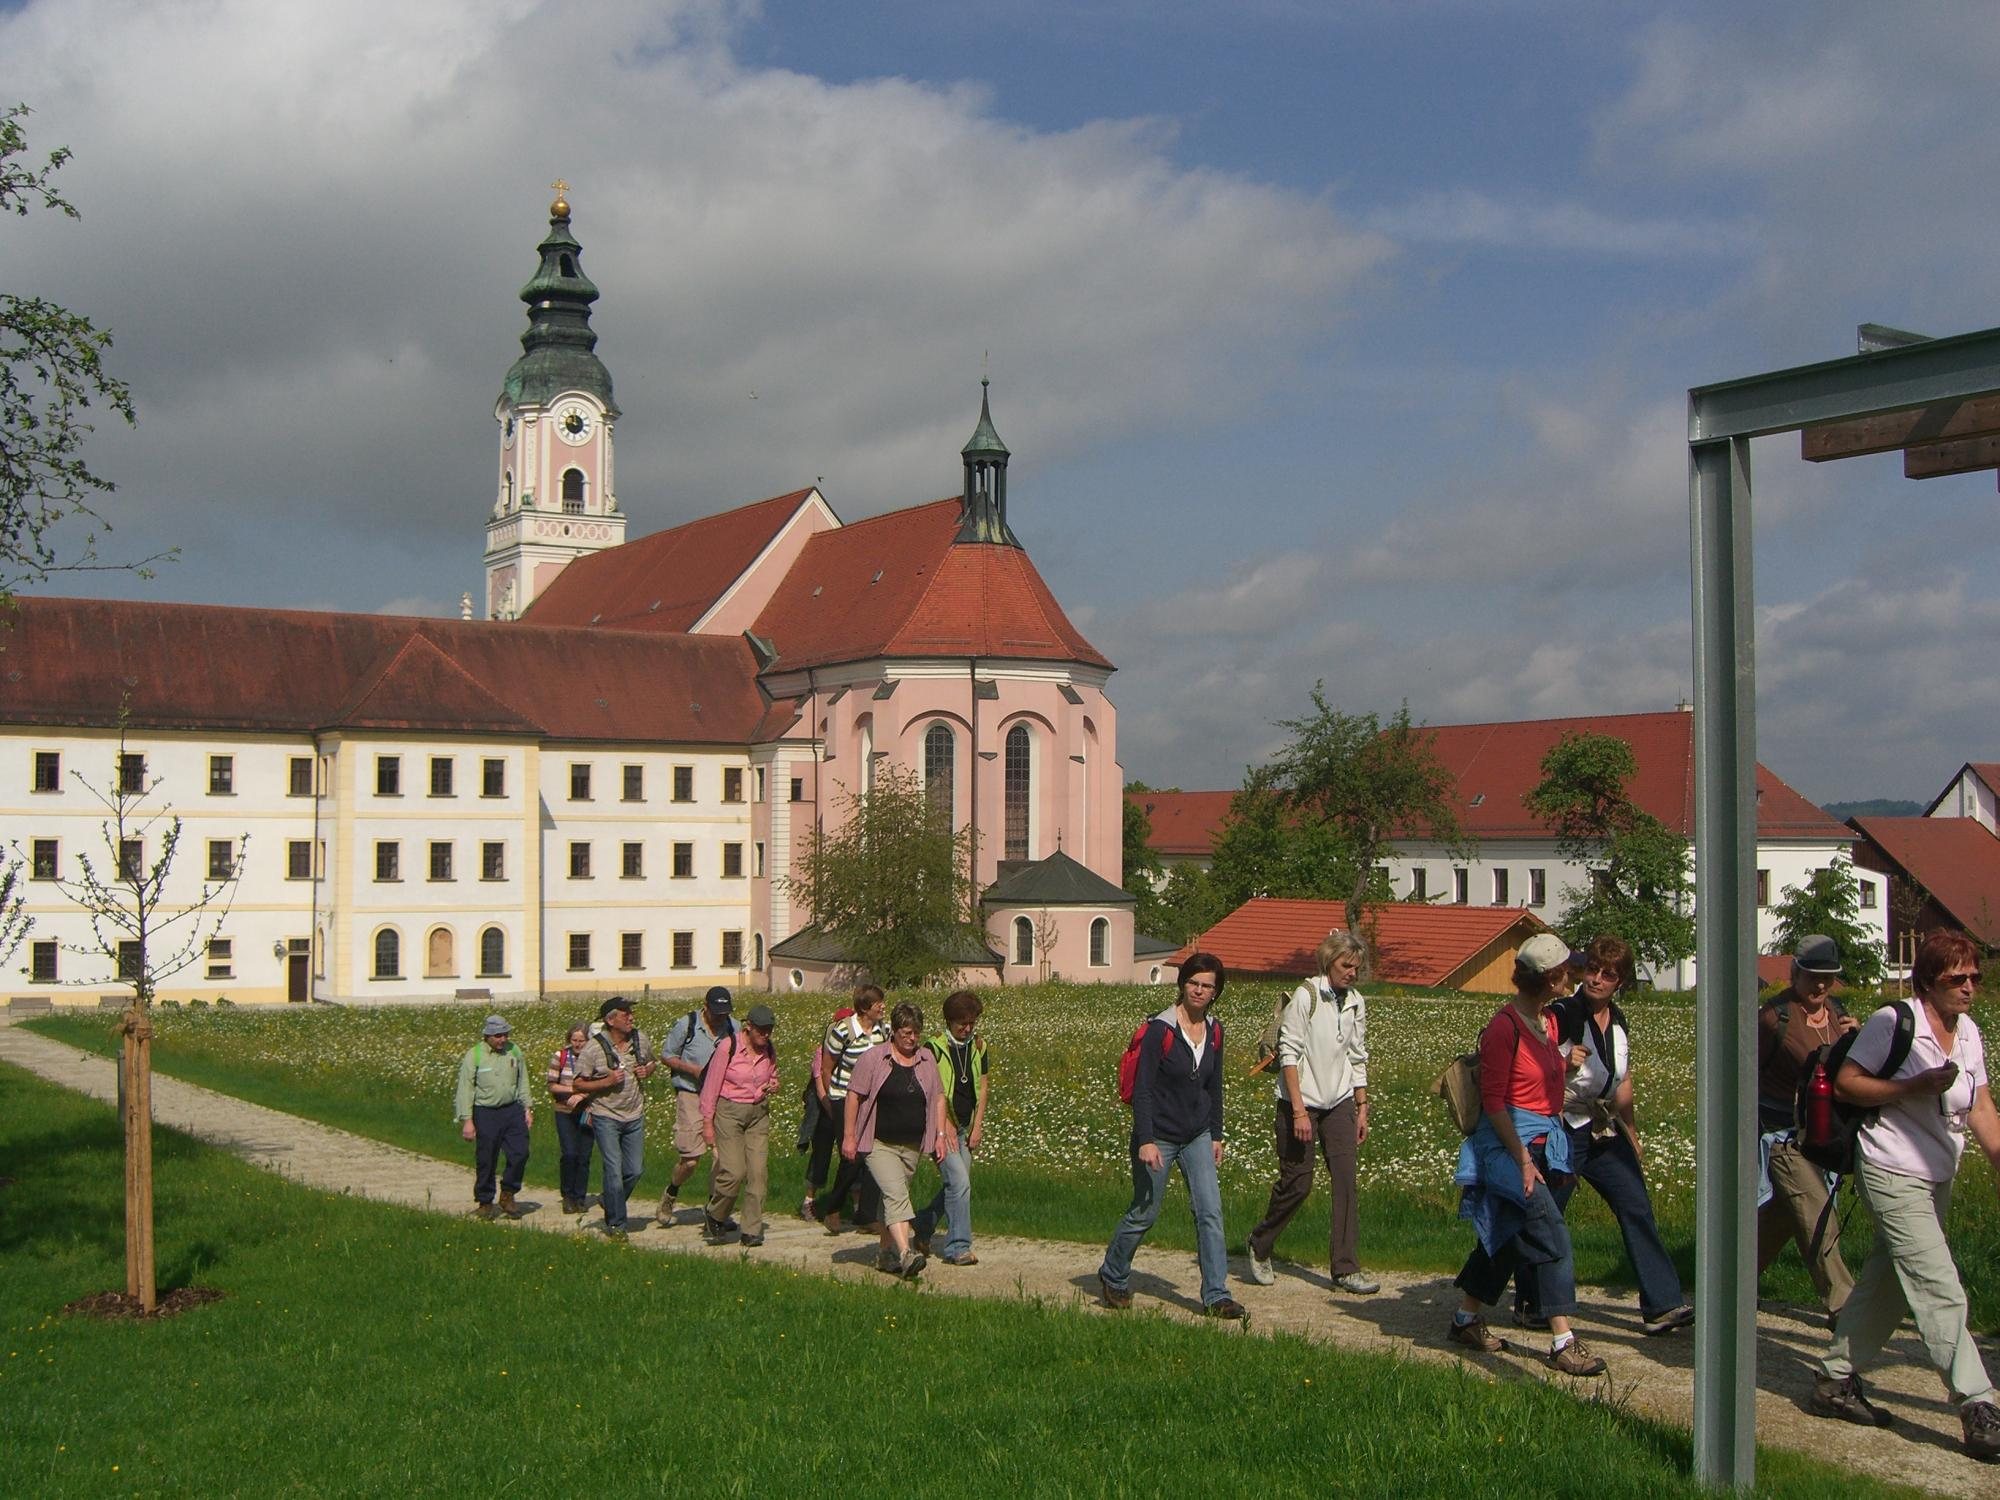 VIA NOVA Aldersbach